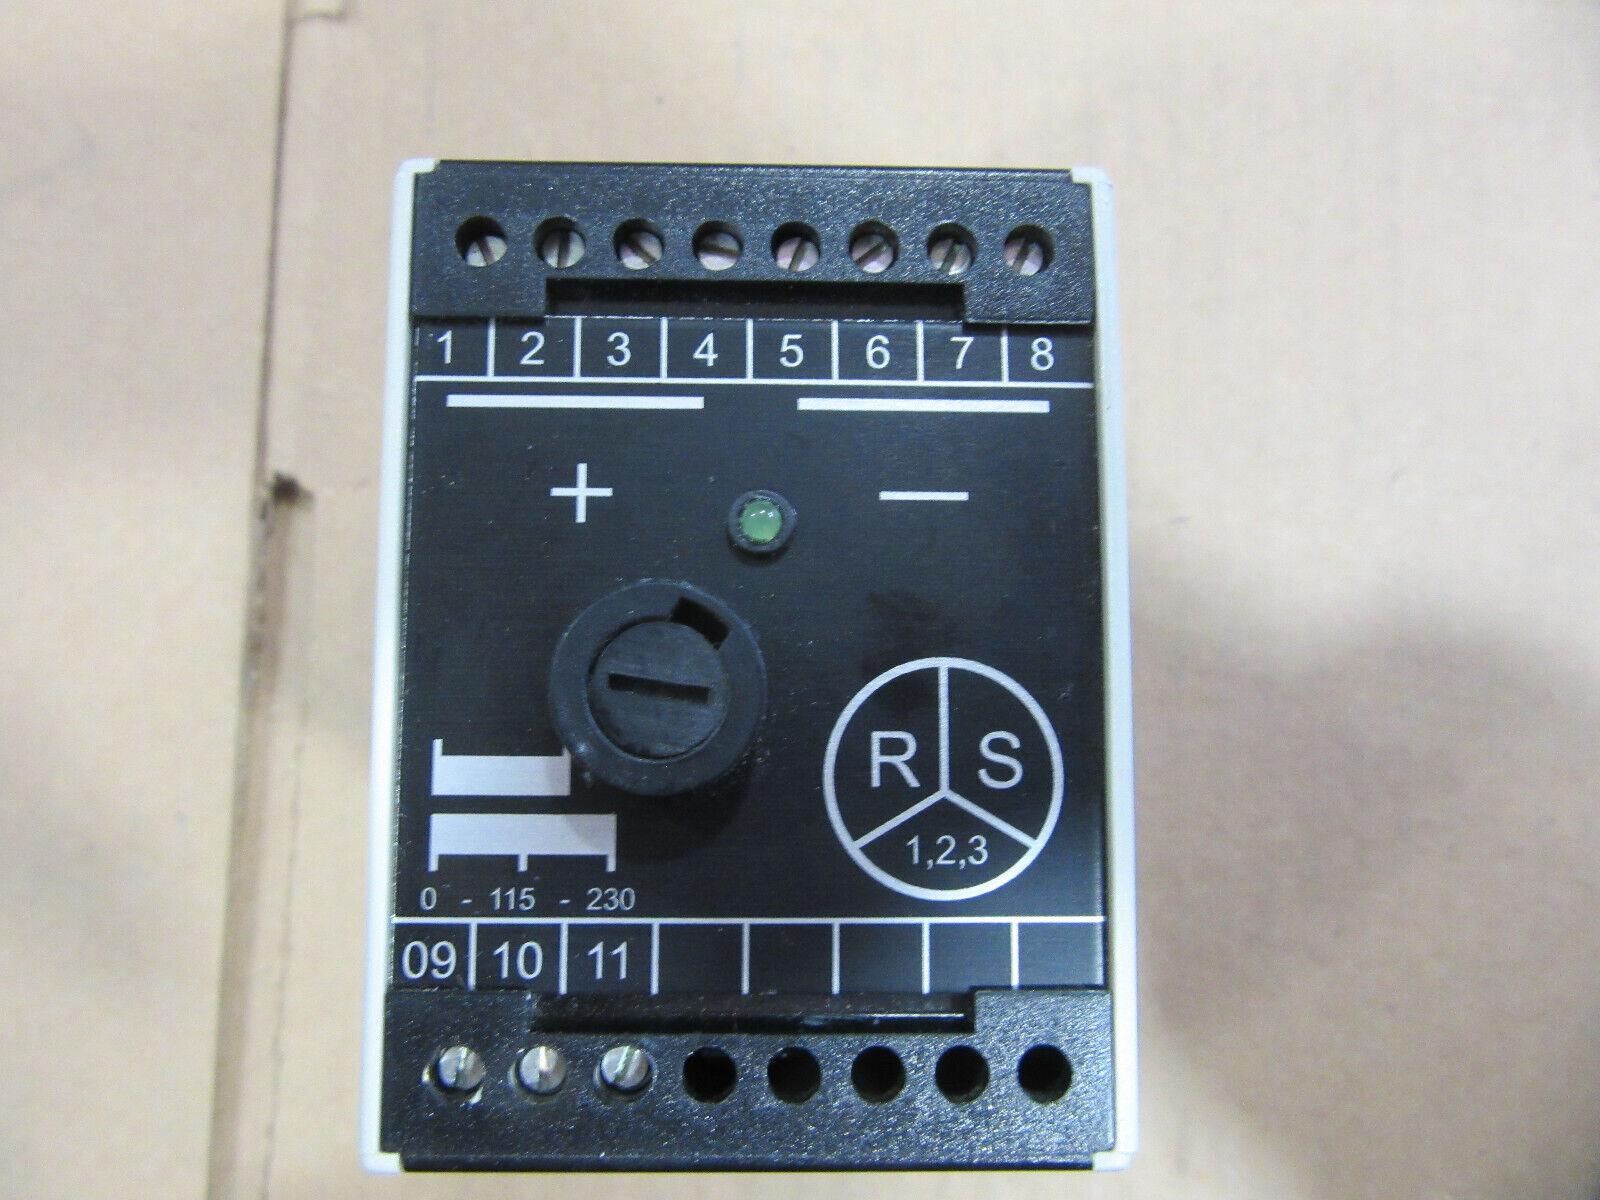 Robers PGSV0001 Control Transformer 24VA Primary 230 115V Secondary 24VDC VGC